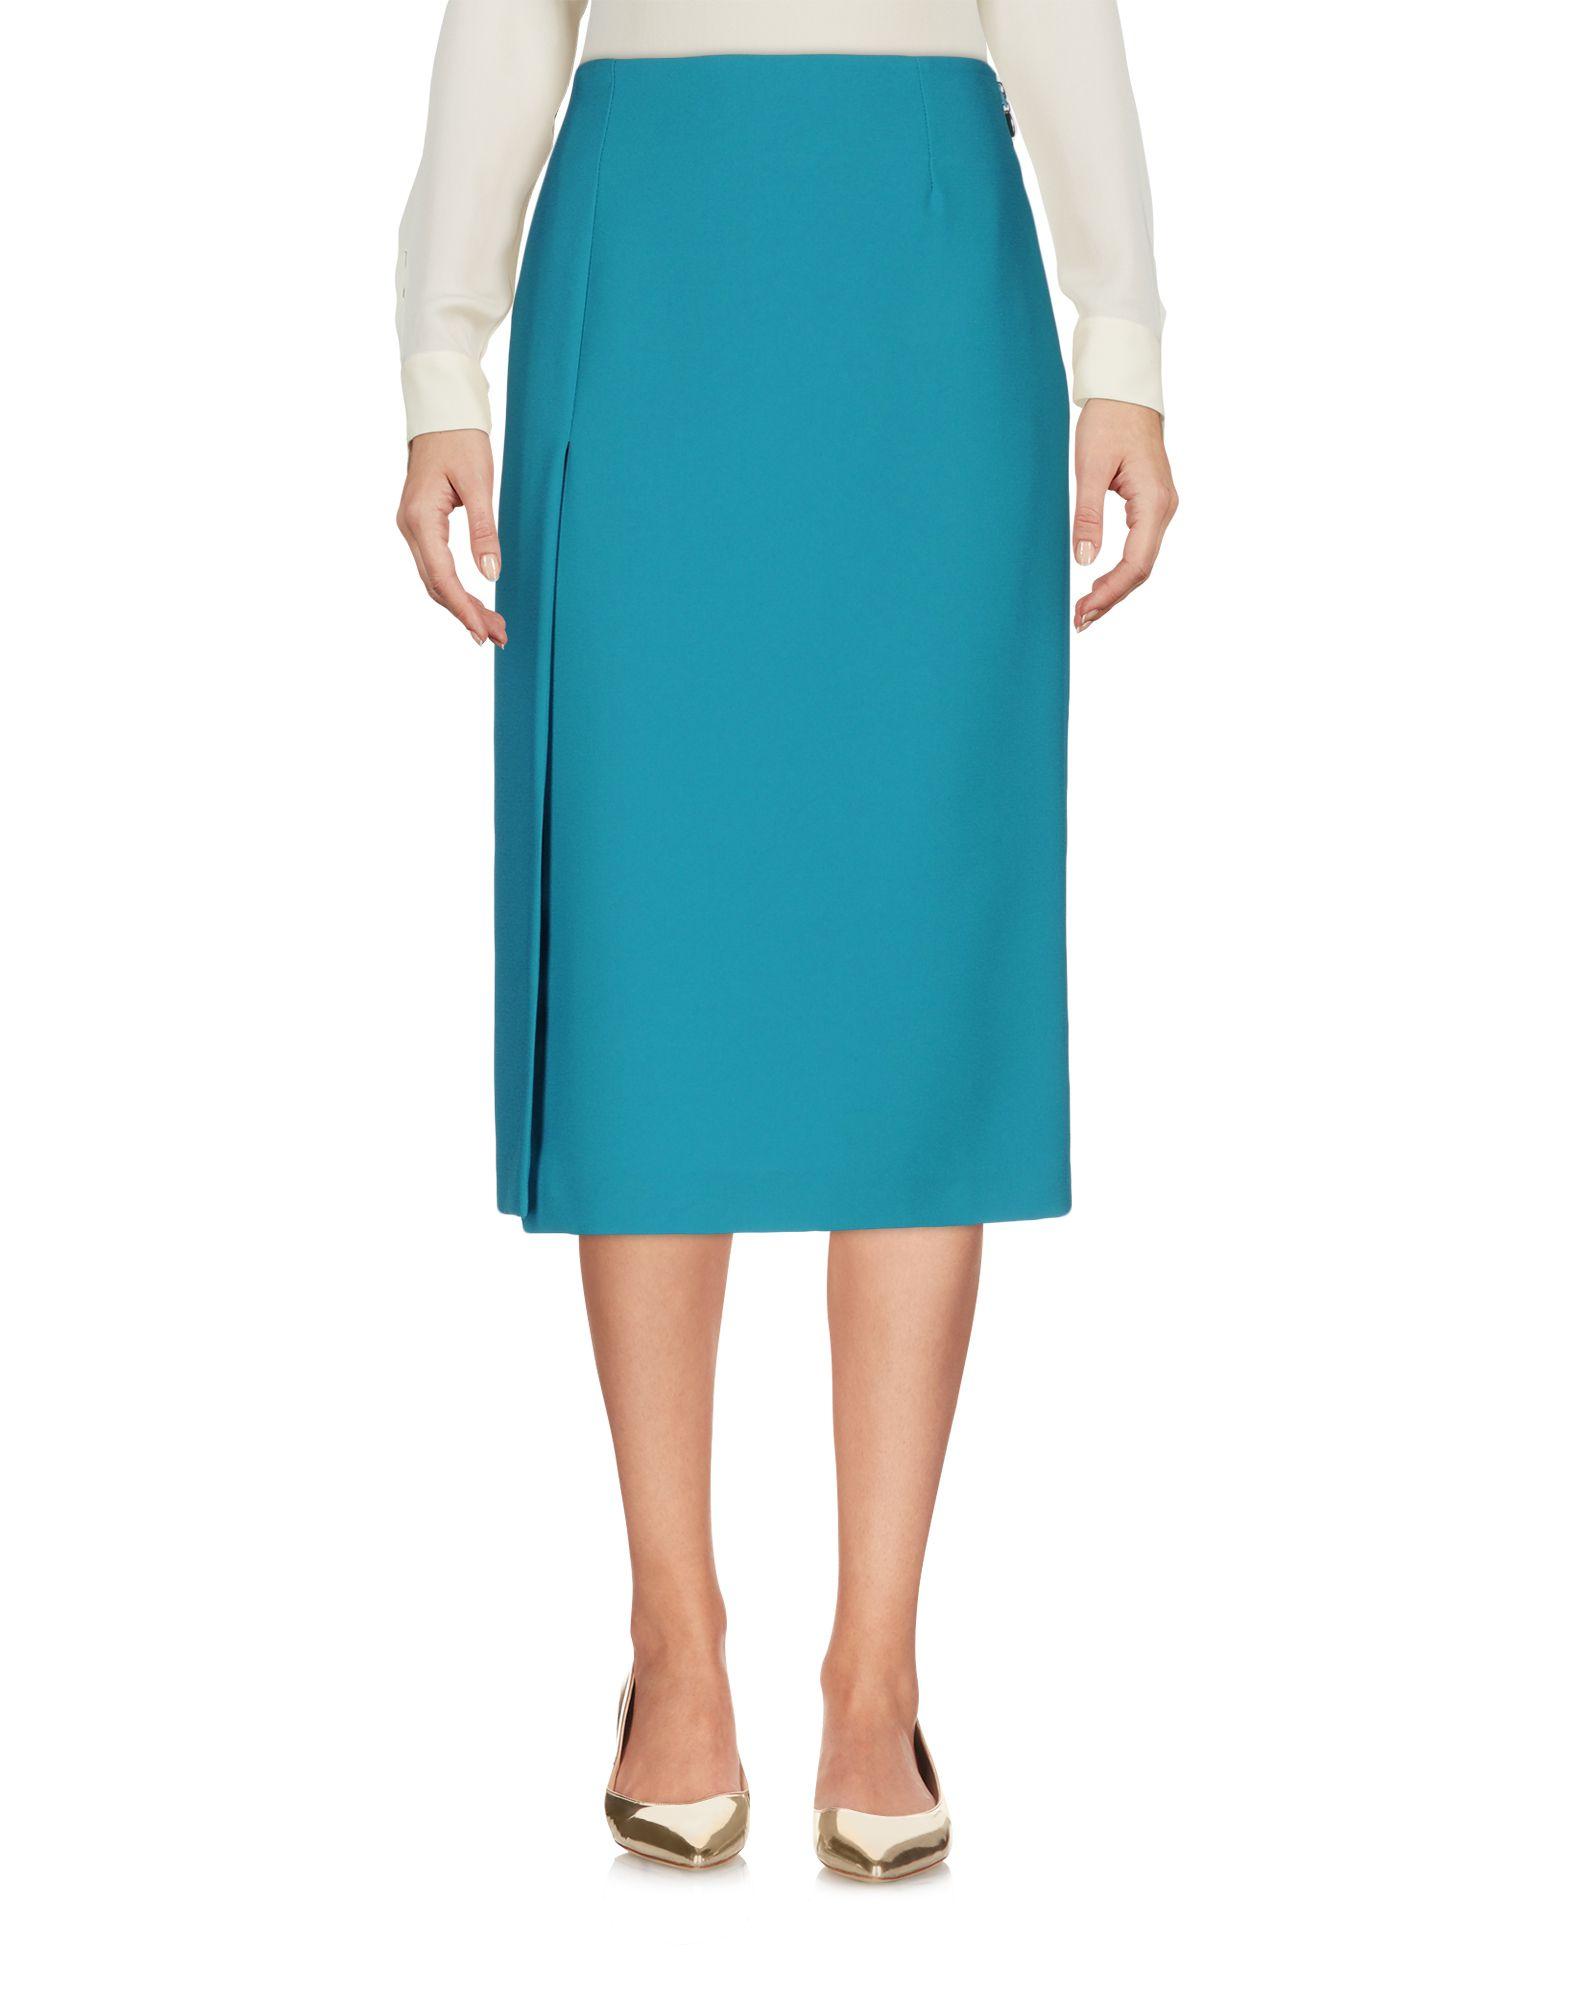 ANNIE P. Юбка длиной 3/4 annie p платье длиной 3 4